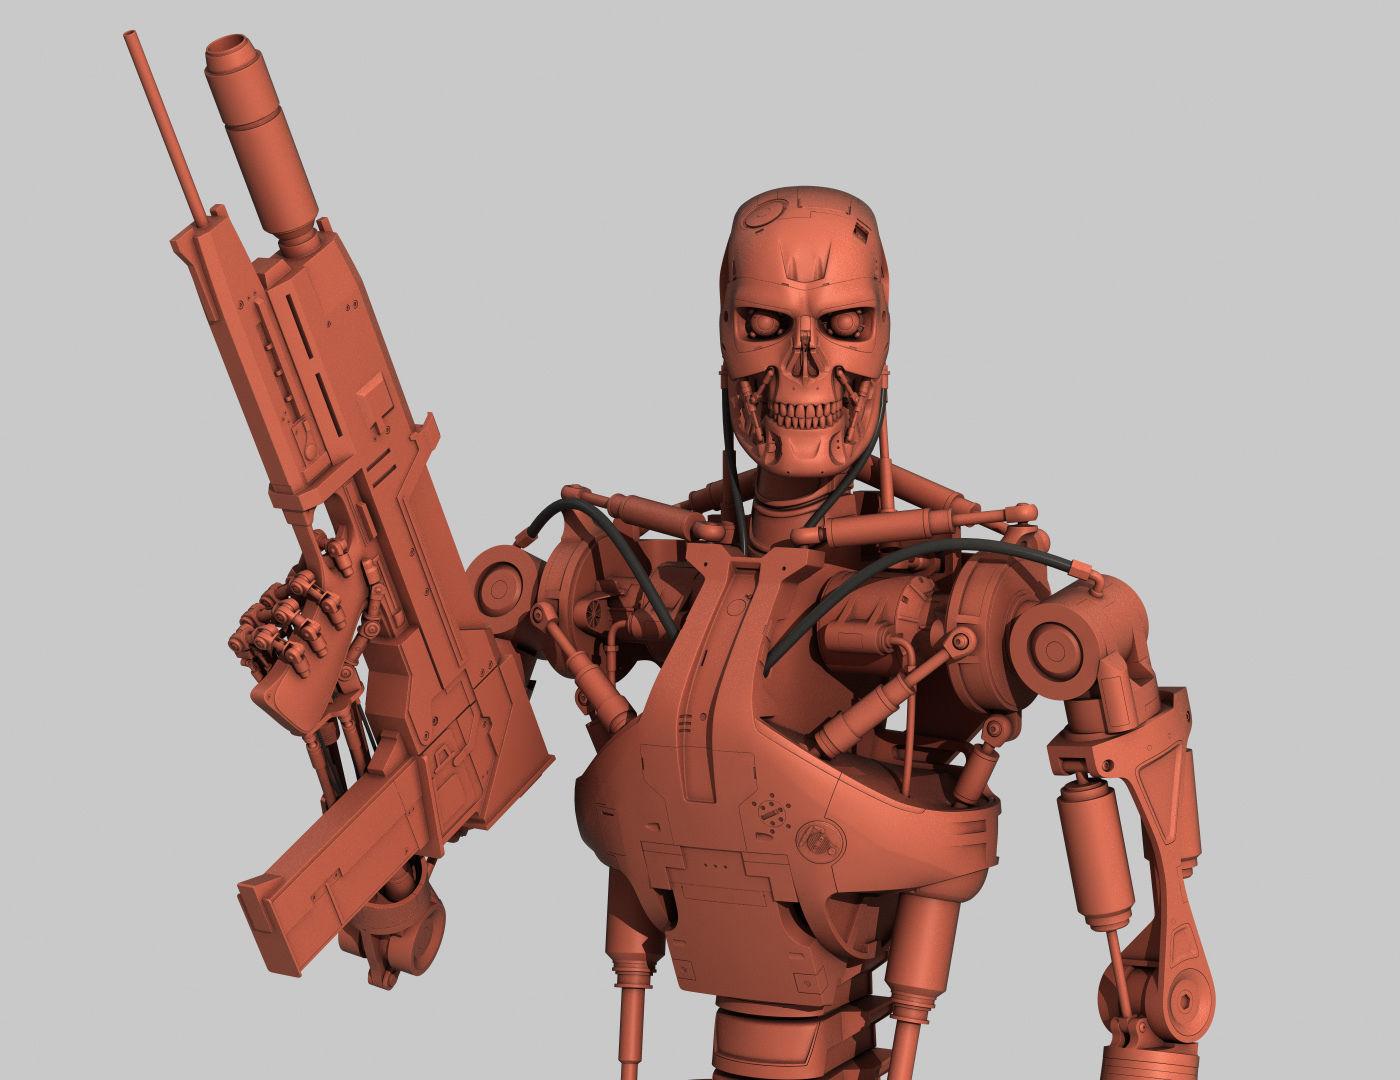 Terminator T-800 Endoskeleton for 3d printing